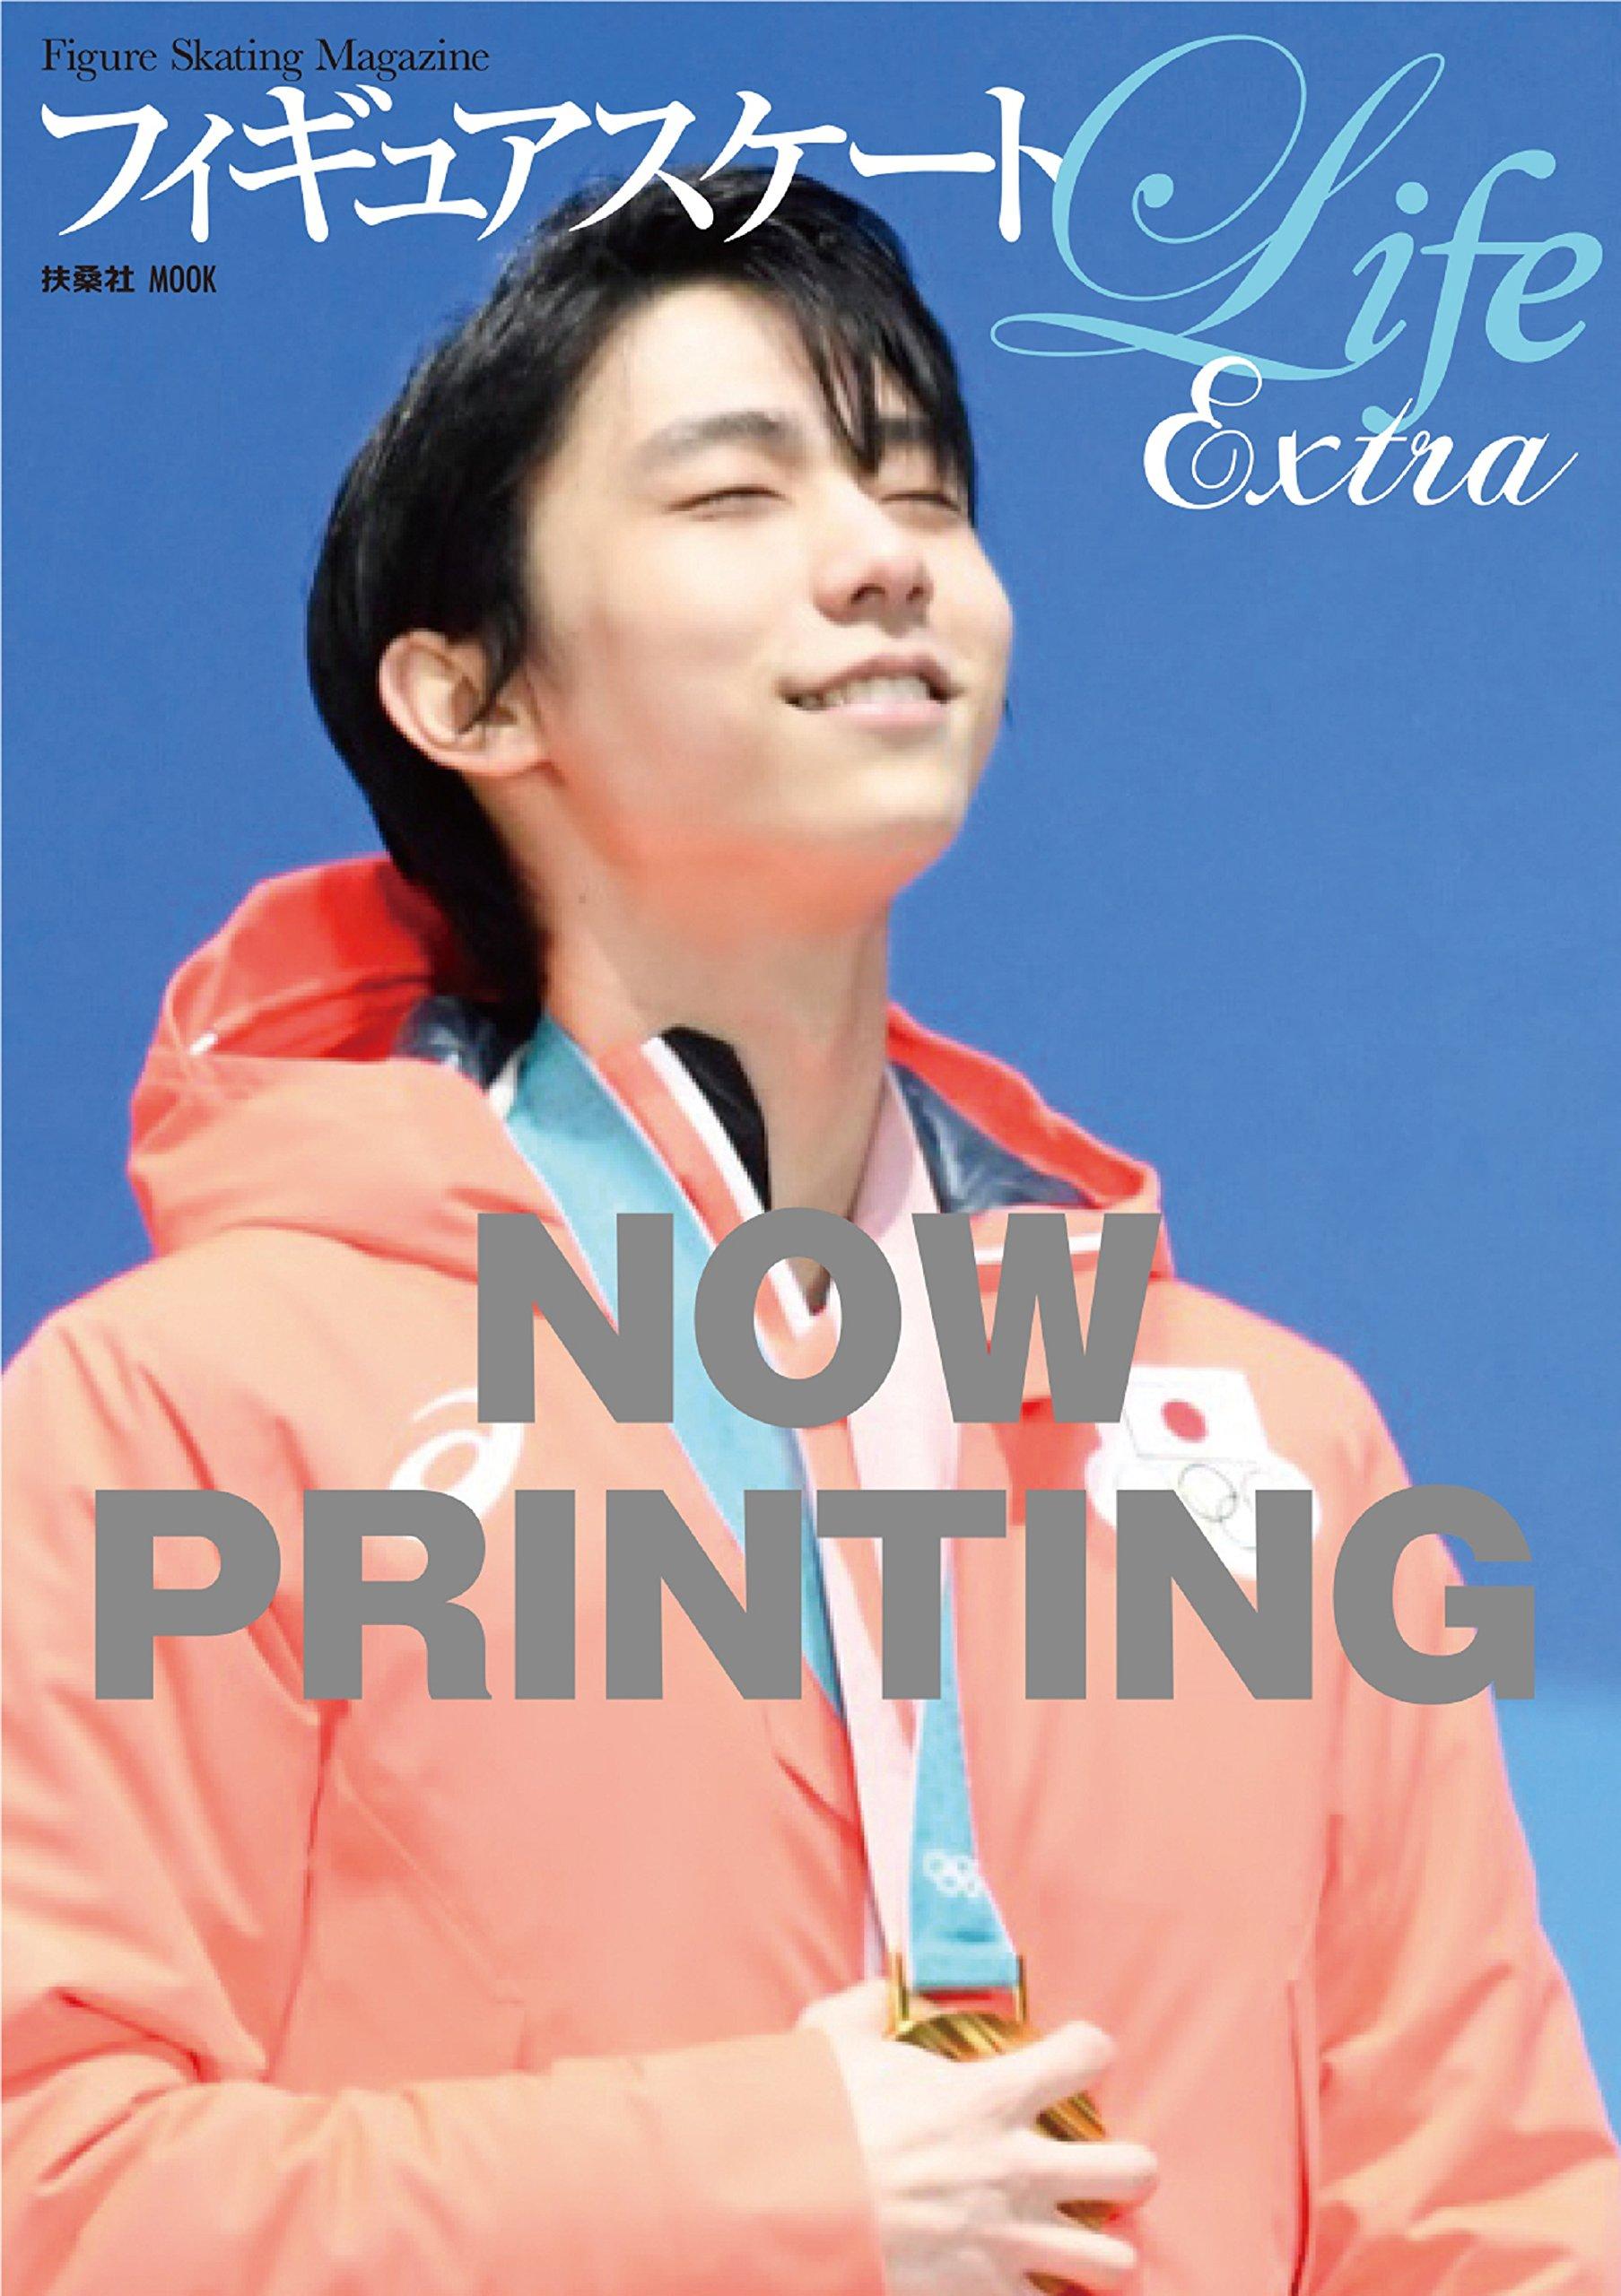 Risultati immagini per フィギュアスケートLife Extra 平昌オリンピック2018